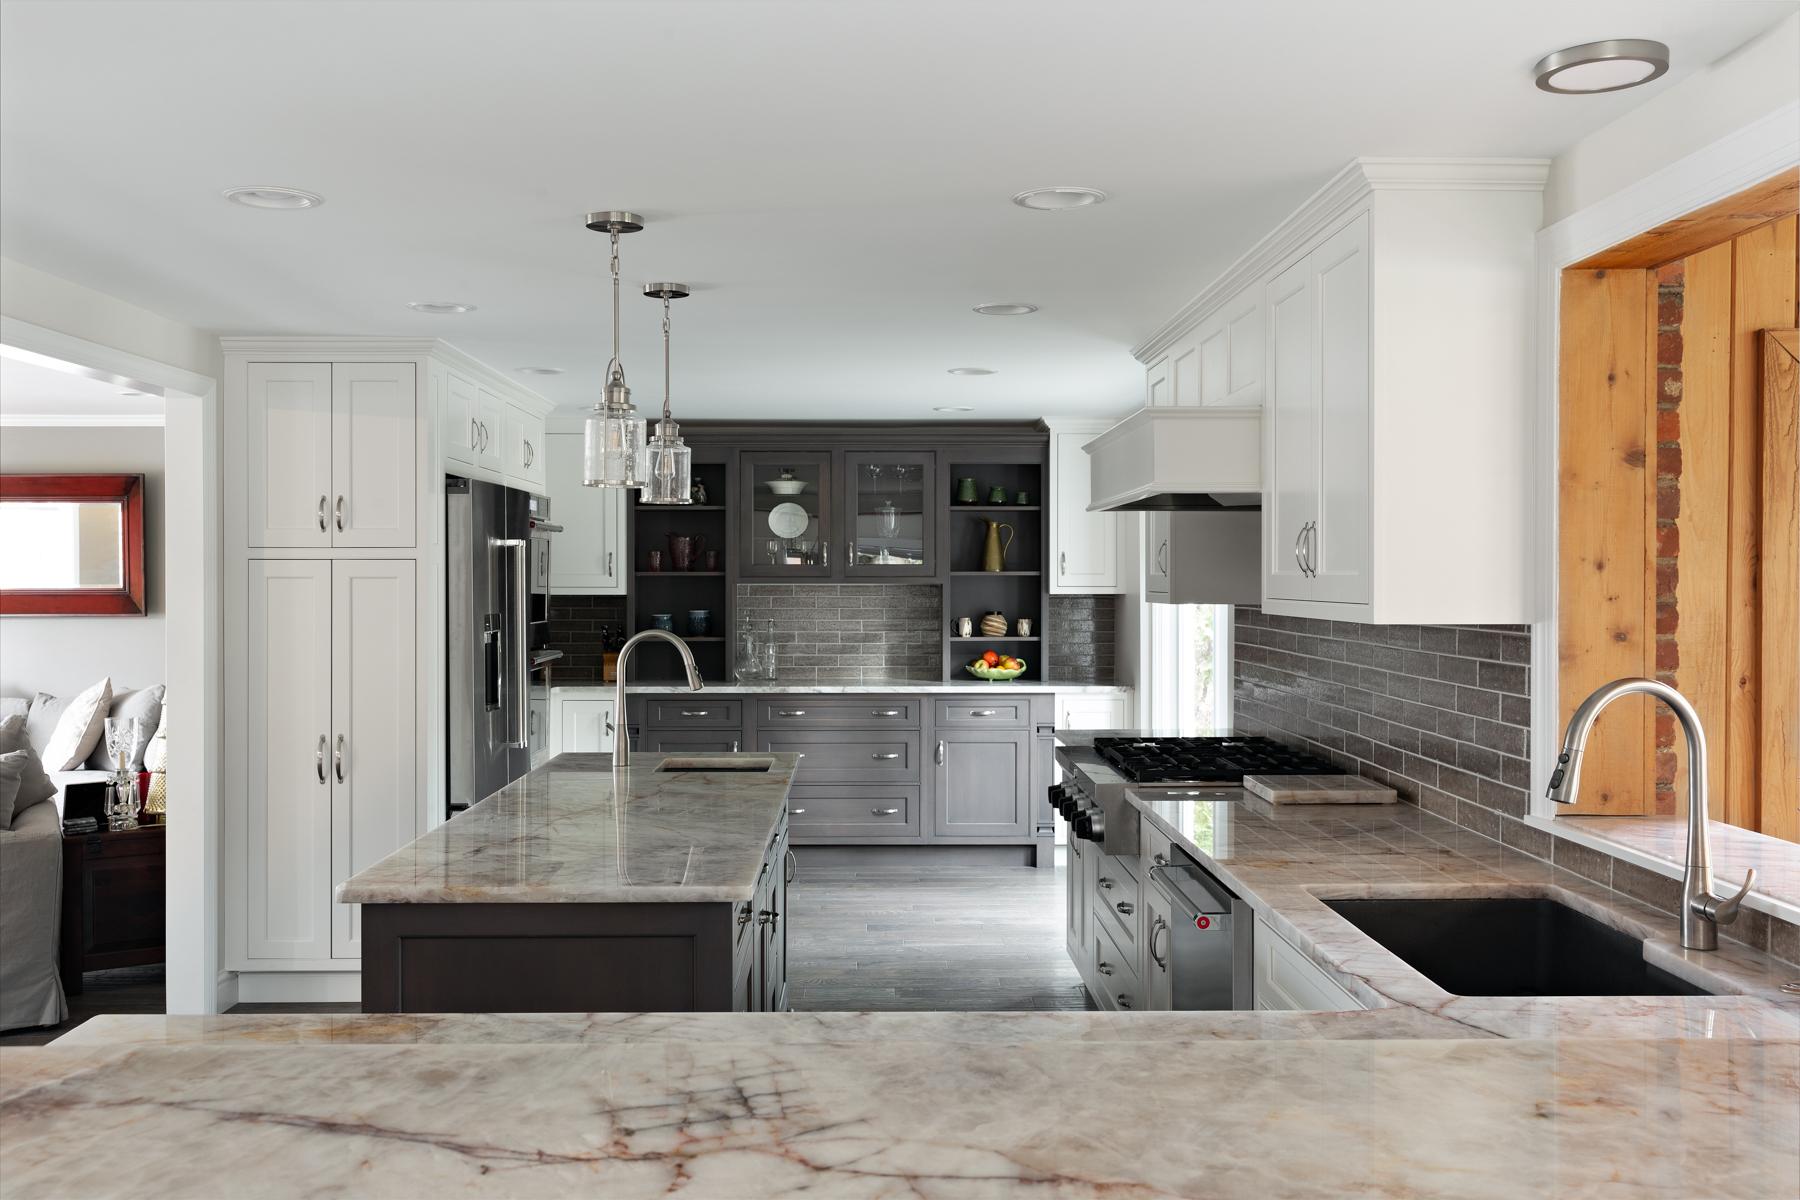 residential-kitchen-1.jpg